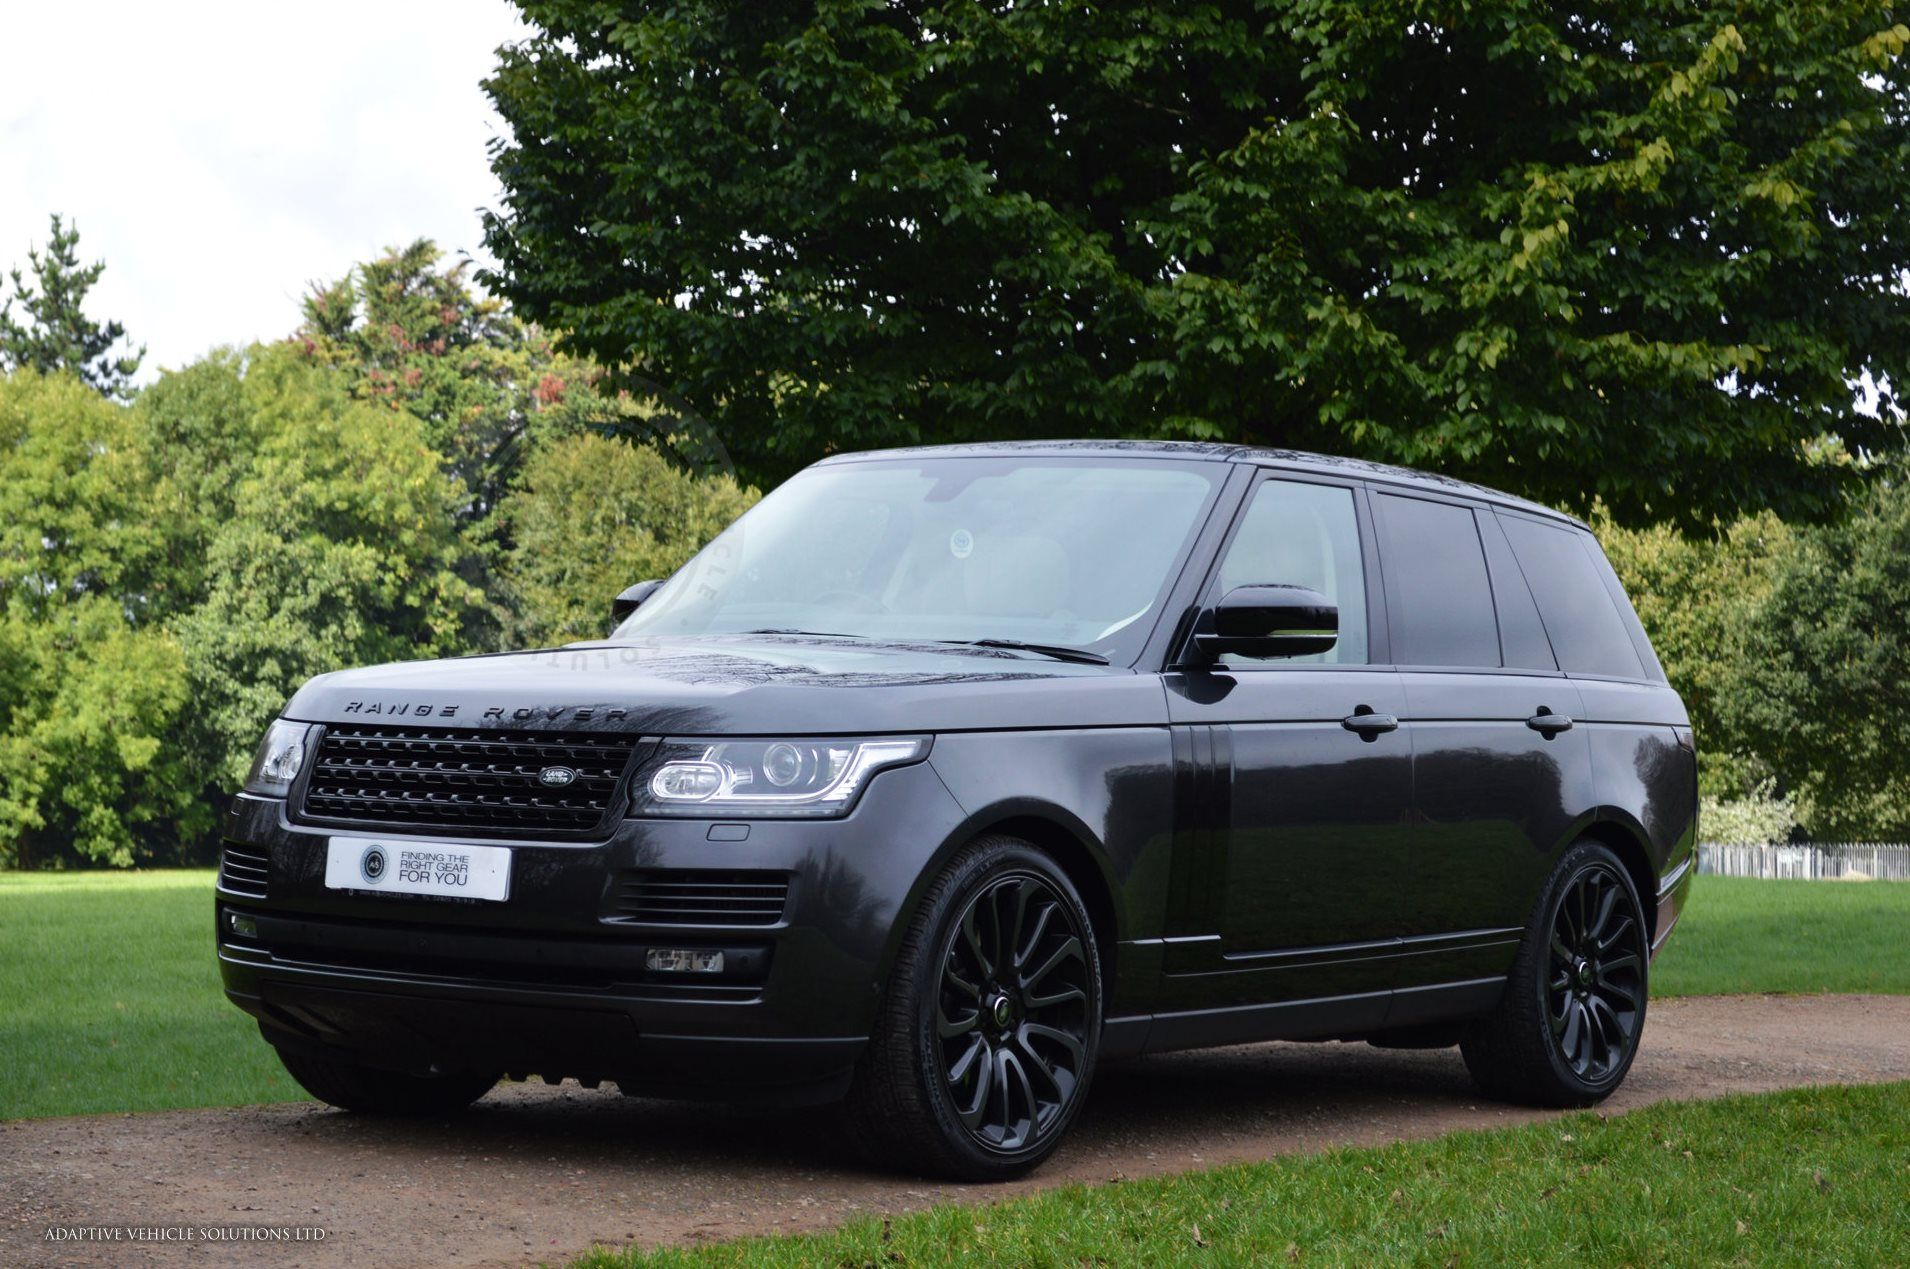 Range Rover Autobiography, Petrol Range Rover, Range Rover